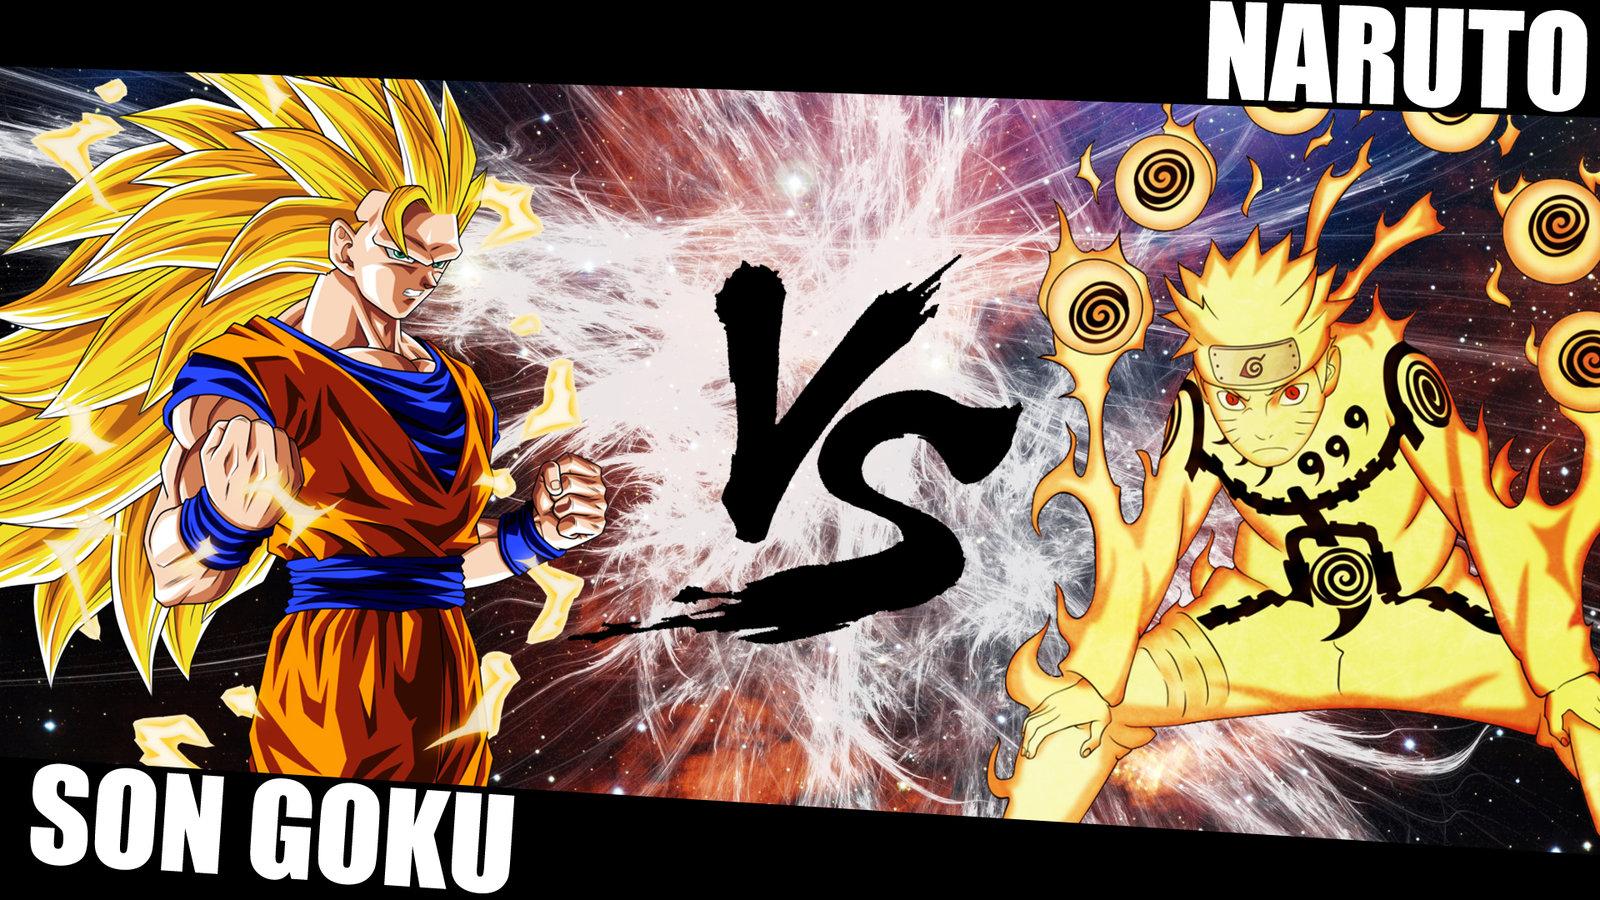 GOKU VS NARUTO Wallpaper by OxeloN 1600x900